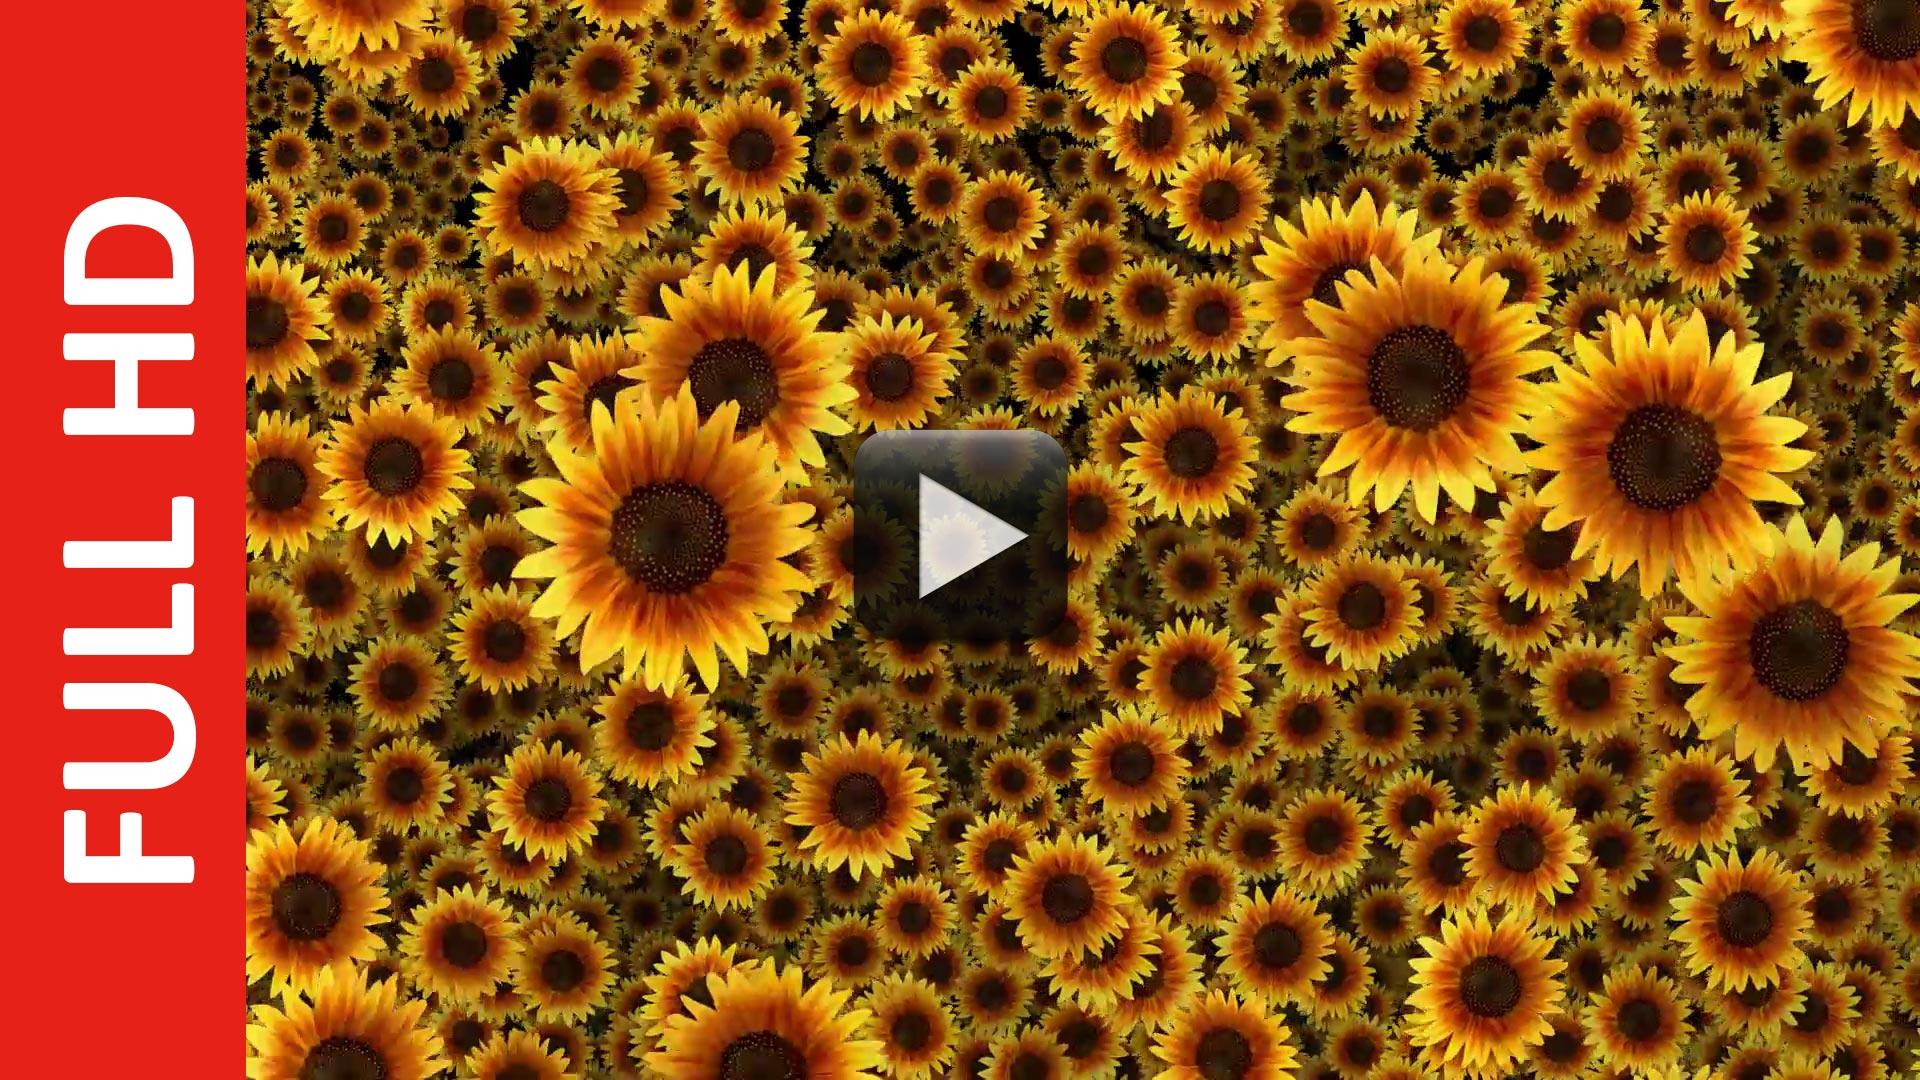 beautiful sunflowers video background hd 1080p